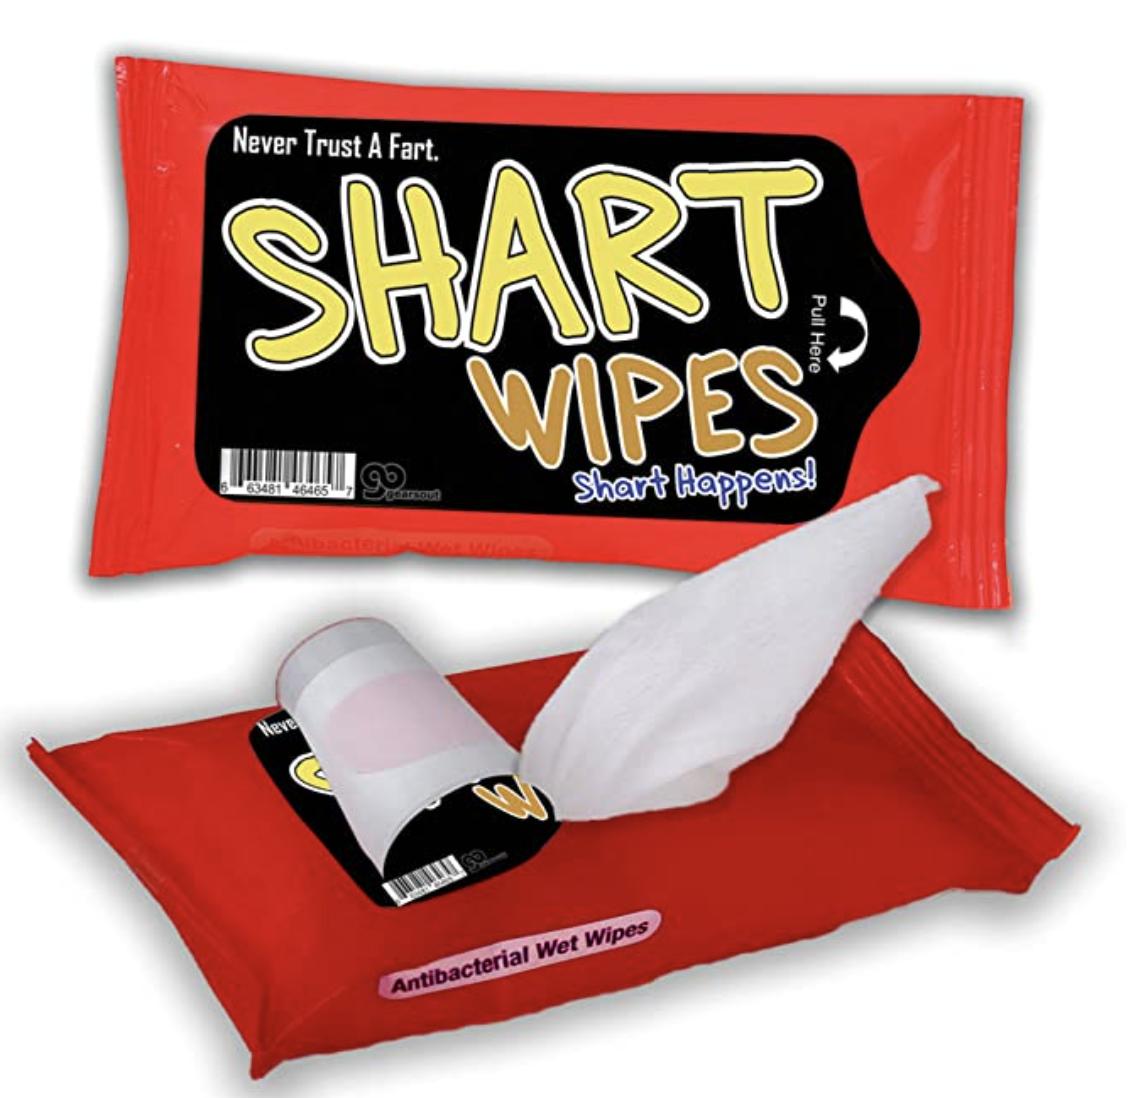 shart wipes